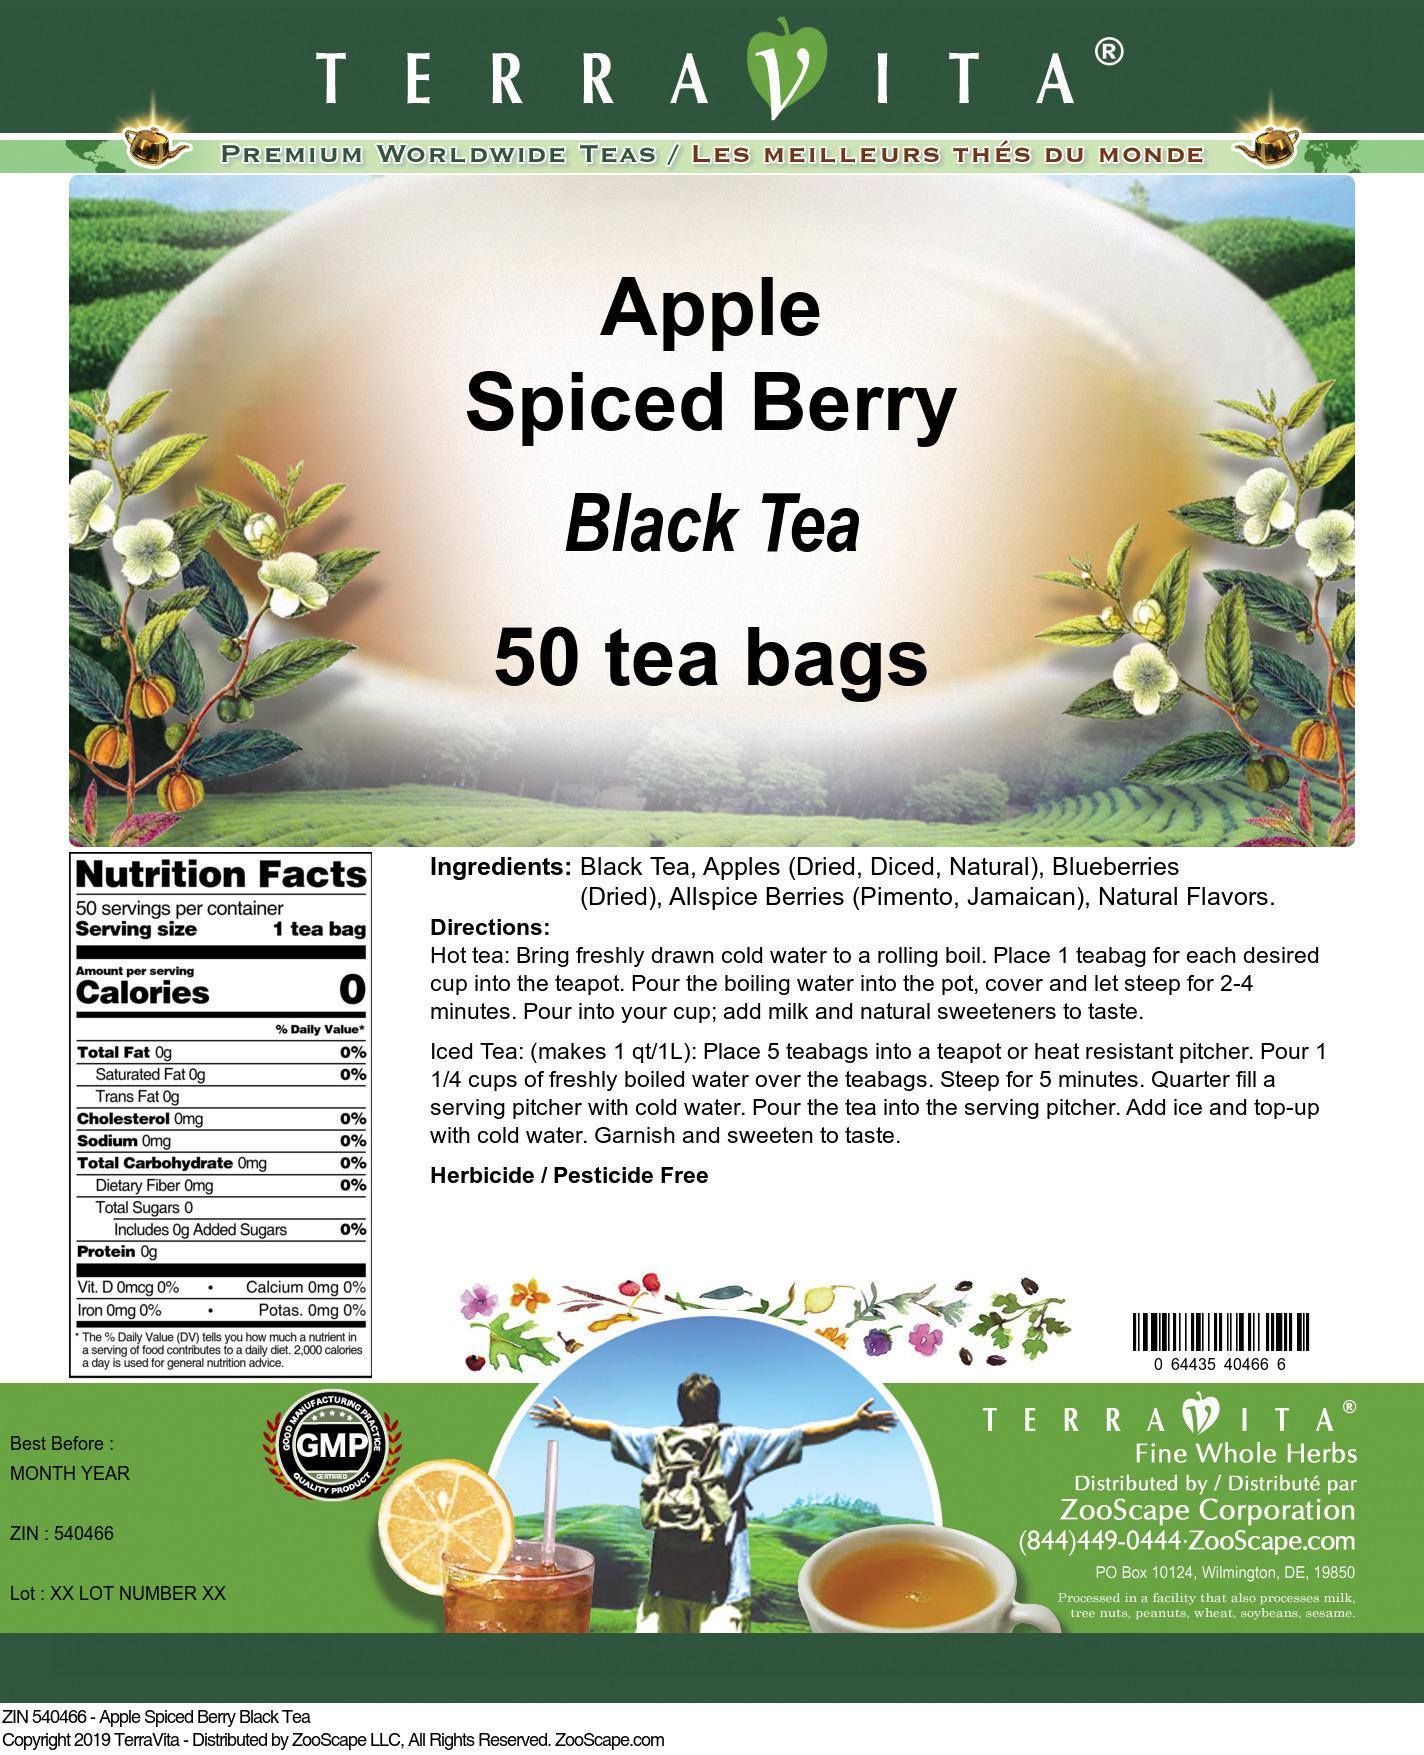 Apple Spiced Berry Black Tea